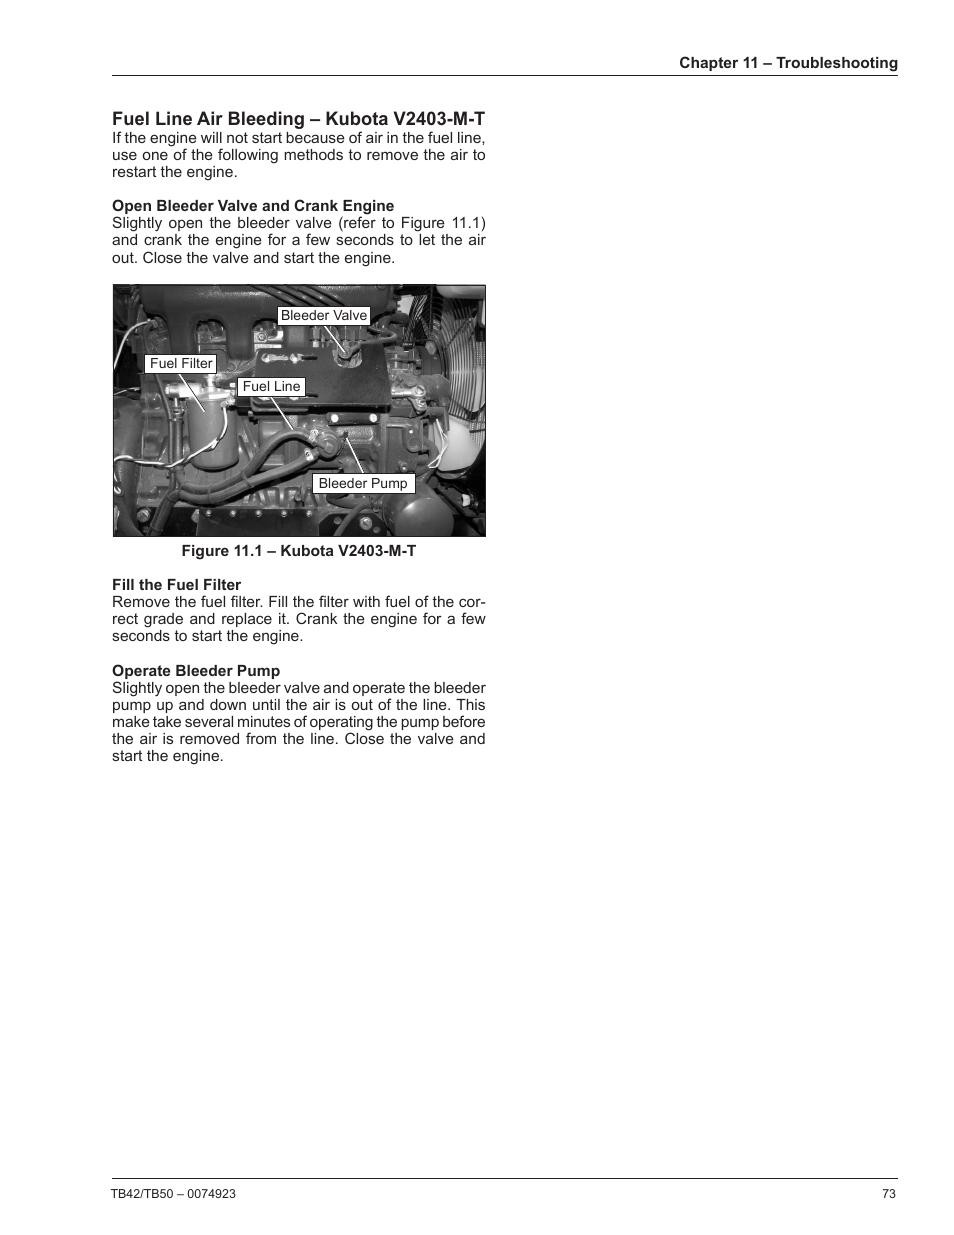 Fuel line air bleeding – kubota v2403-m-t   Snorkel TB50 User Manual   Page  77 / 86